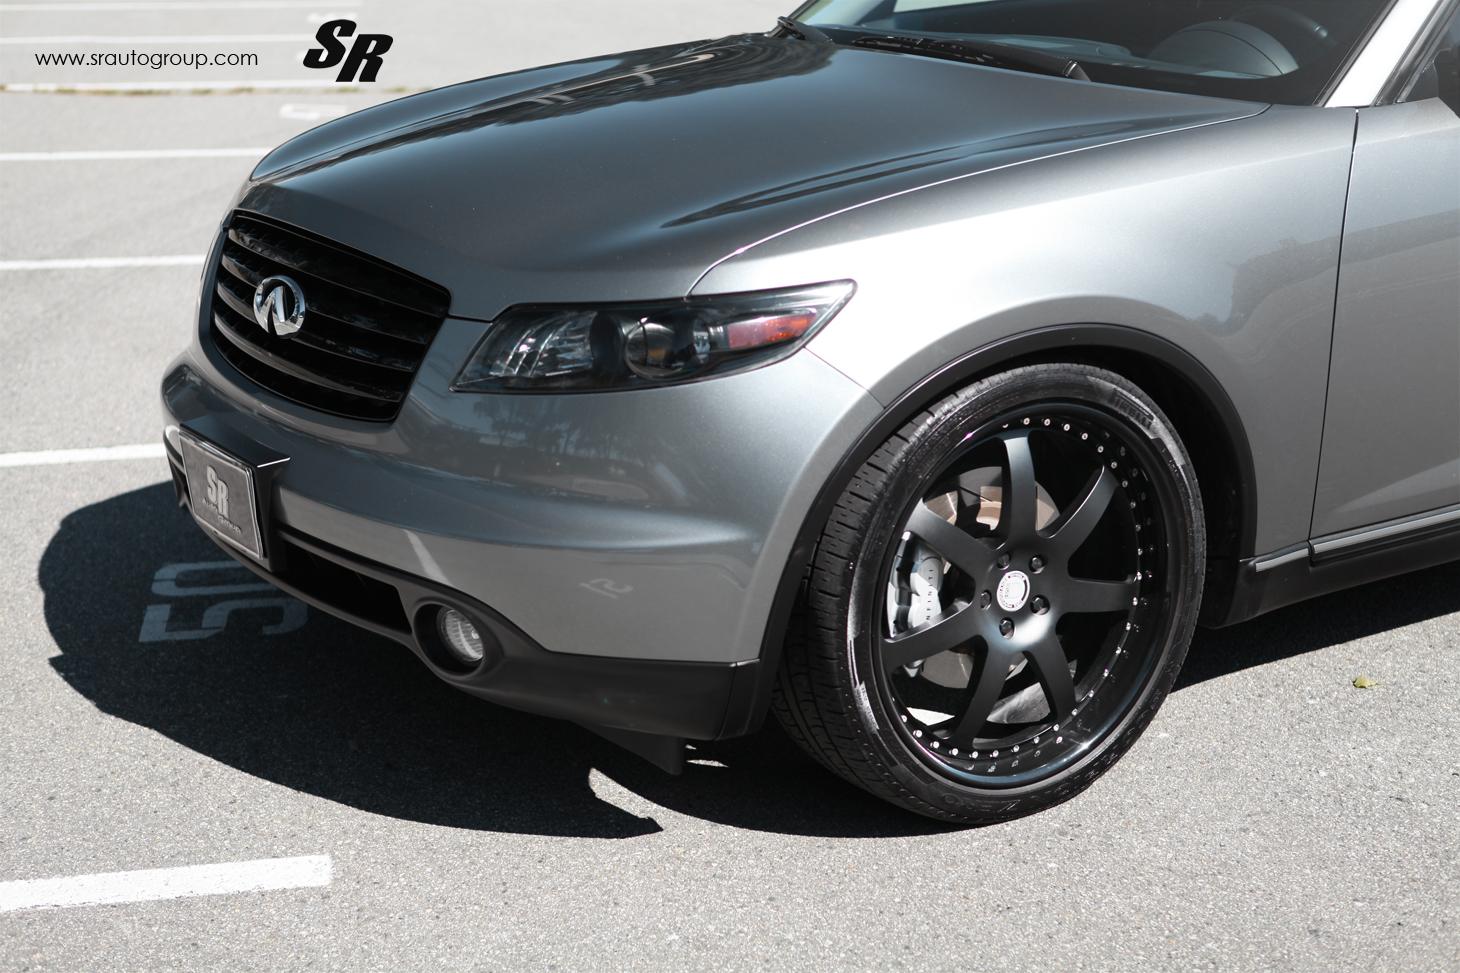 2012 SR Auto Infiniti FX35 Shows Extraordinary Stance